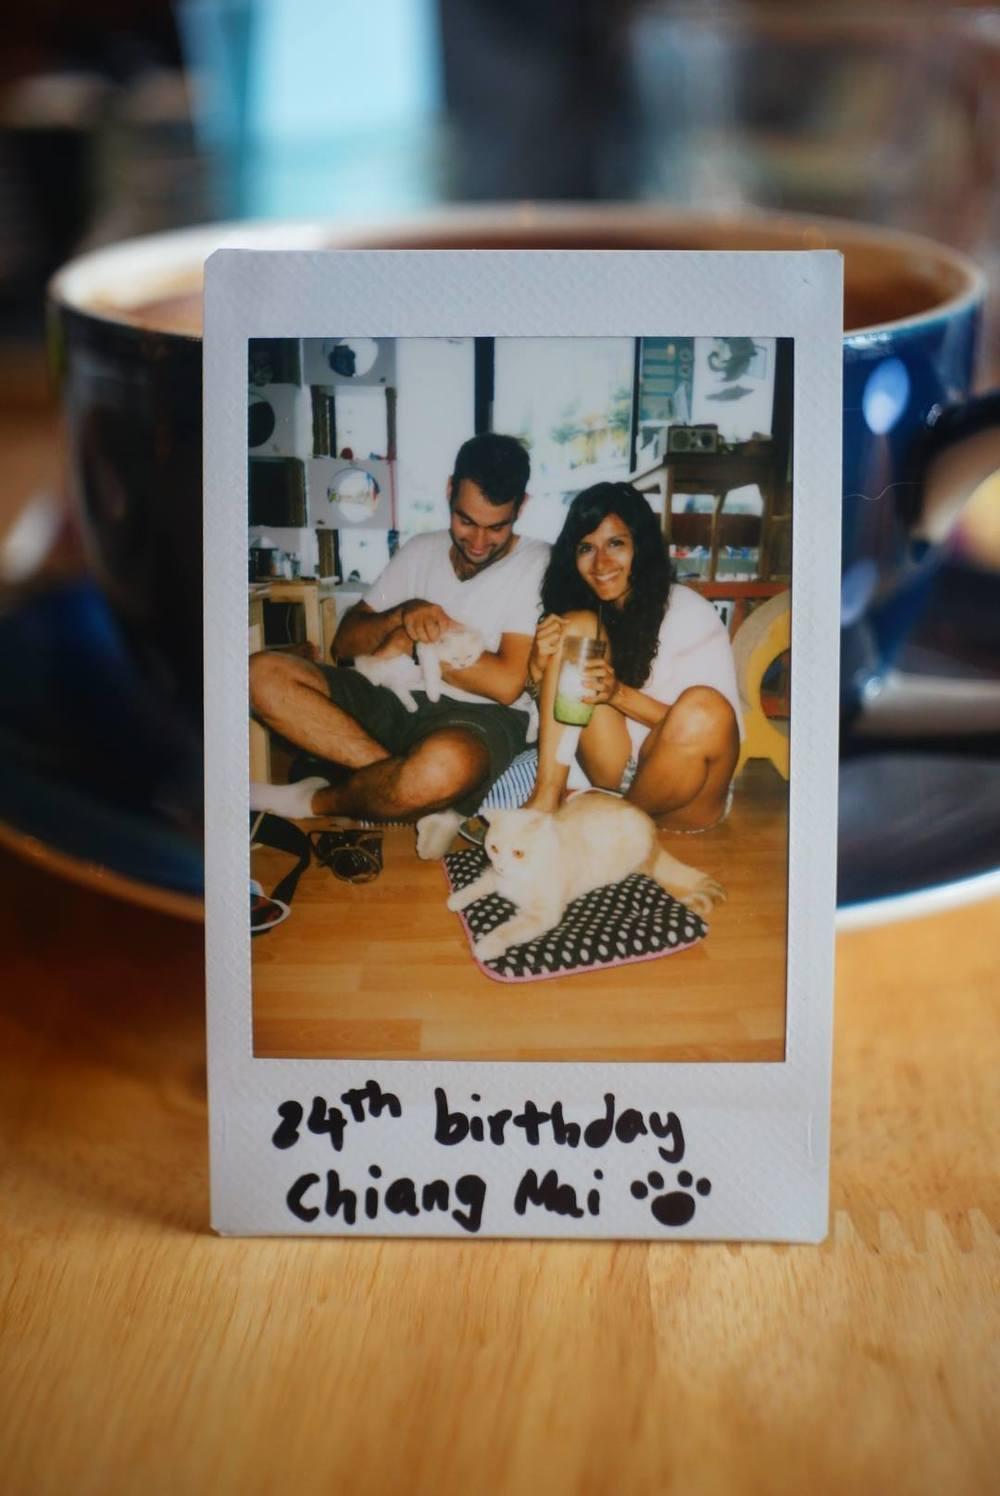 24th birthday, Chiang Mai